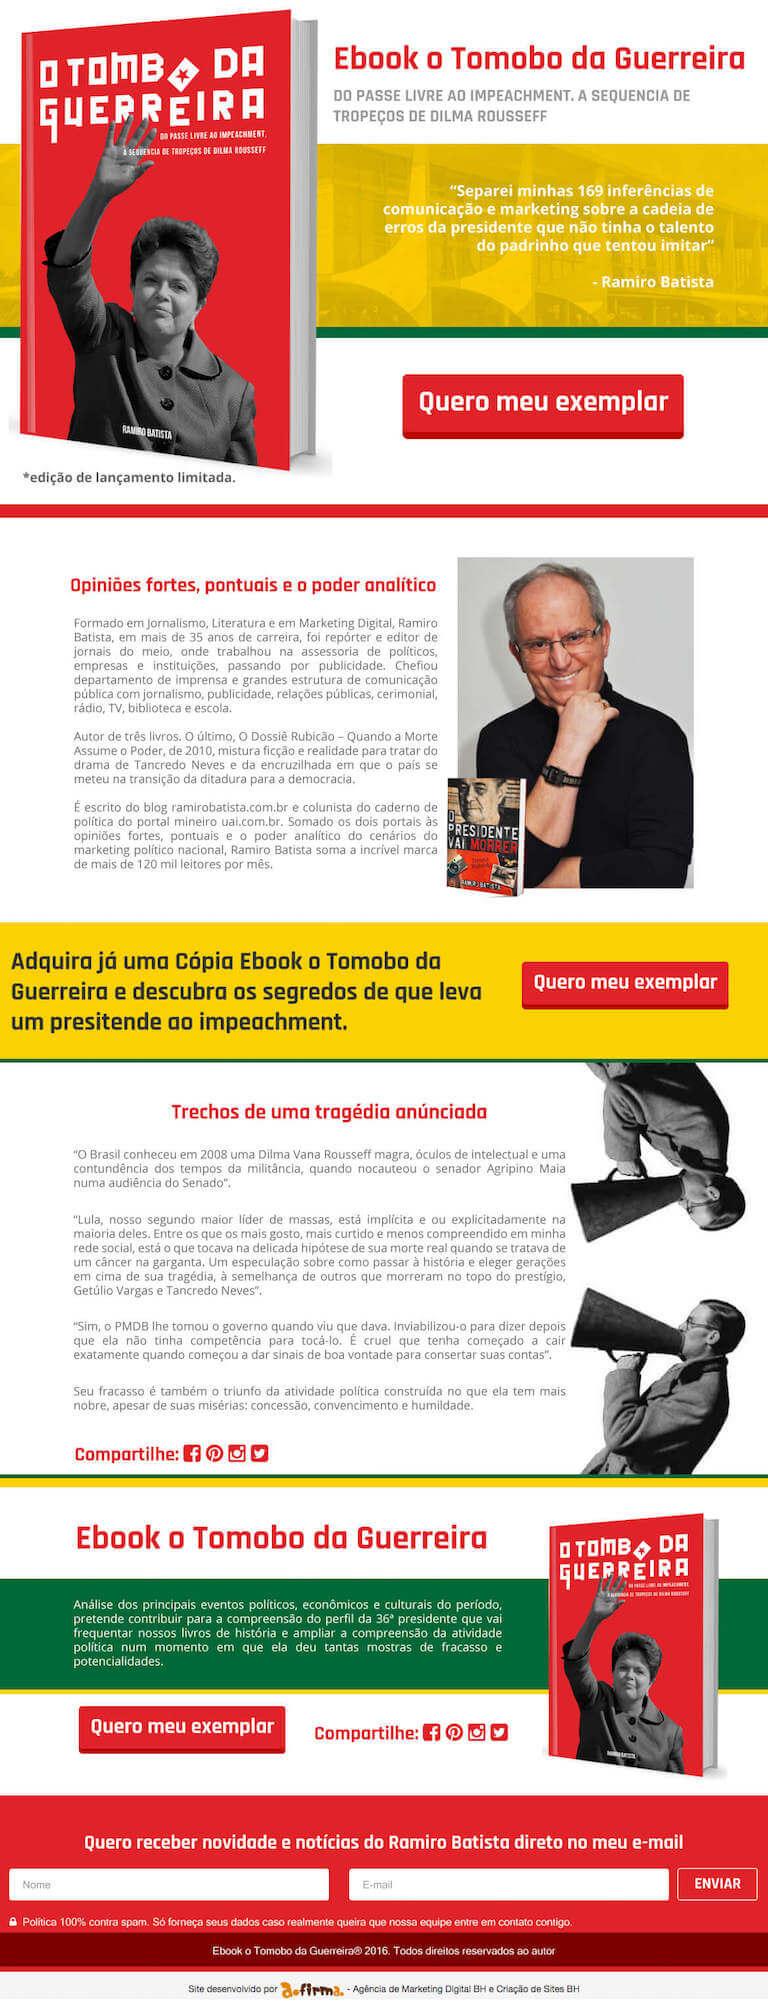 site-ebook-ramiro1